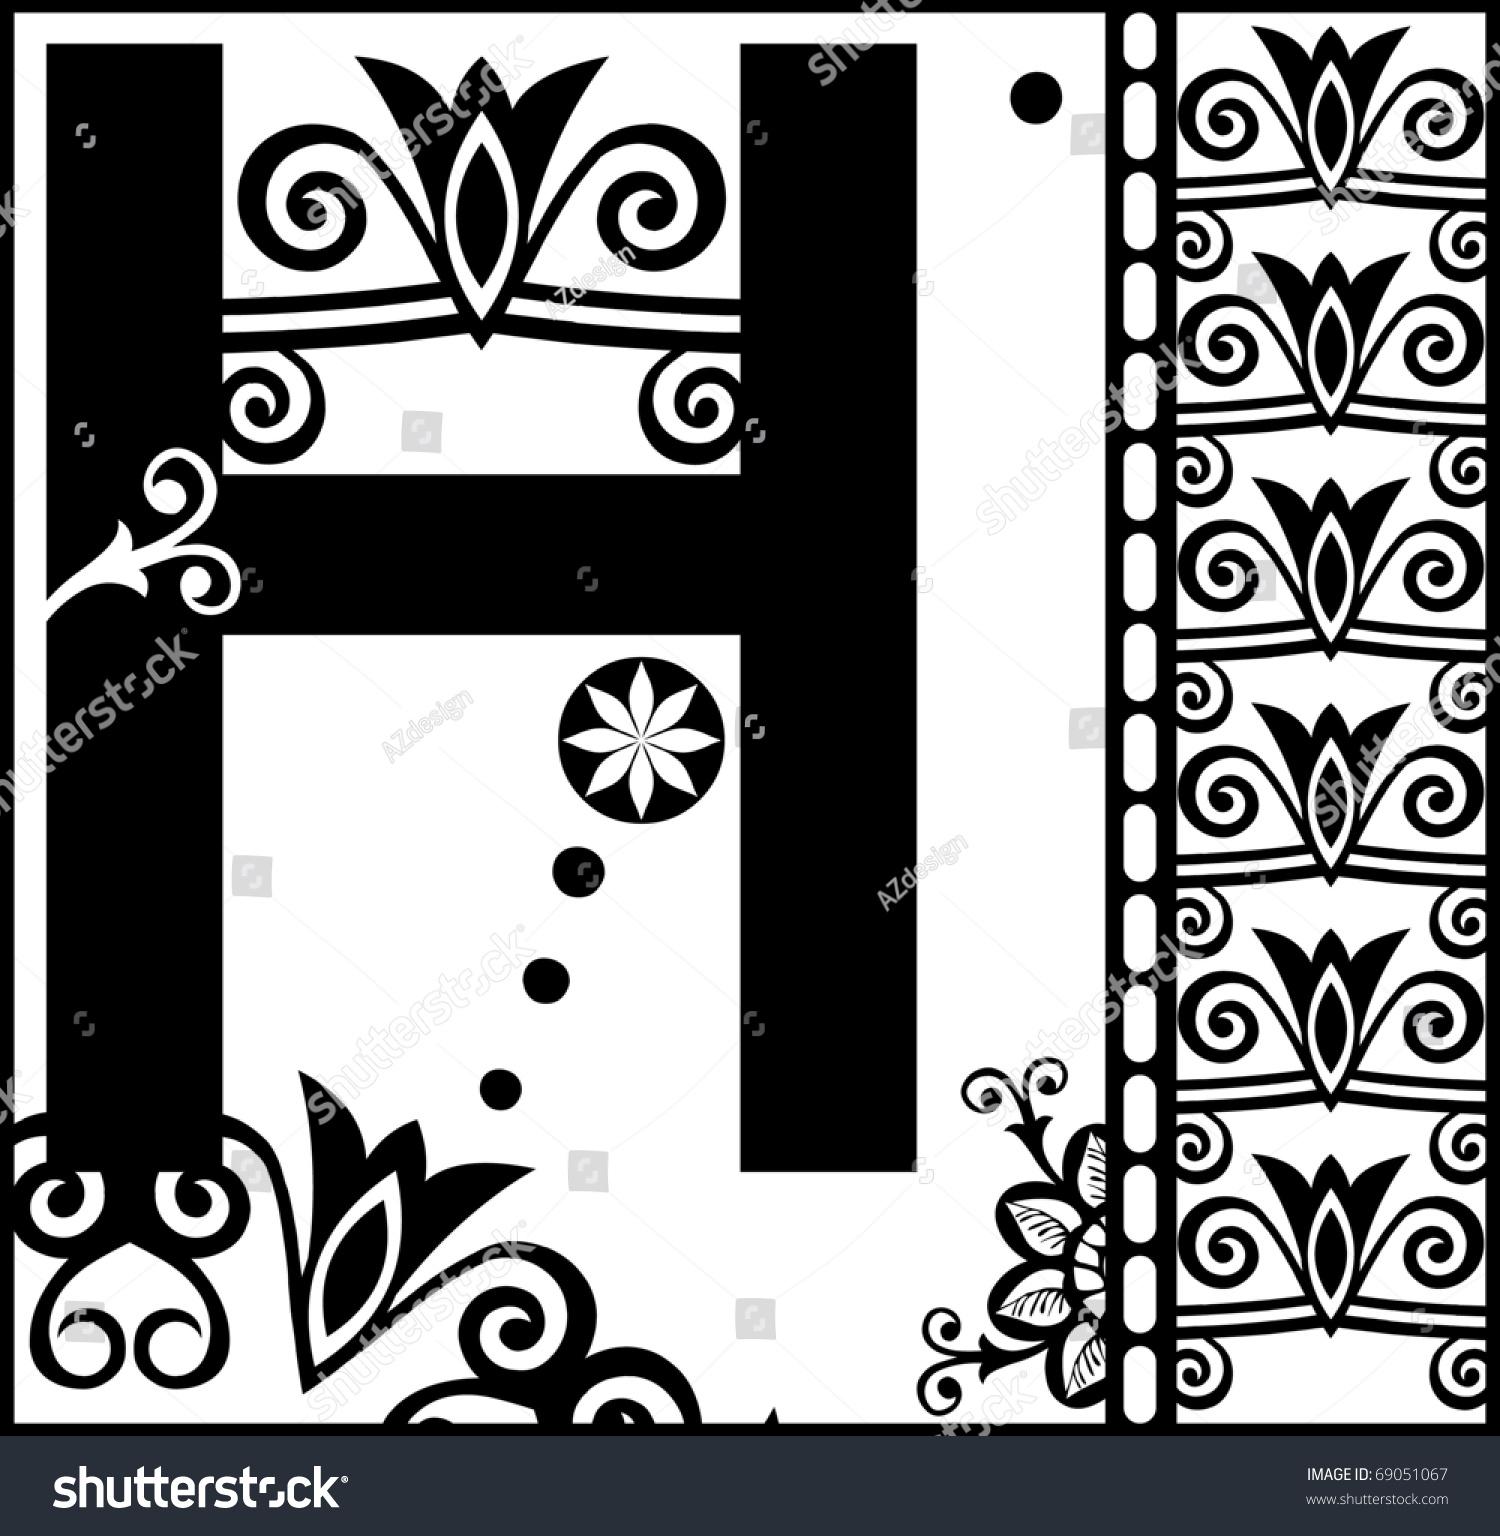 Ornamental abc decorative letter h stock illustration 69051067 ornamental abc decorative letter h altavistaventures Choice Image